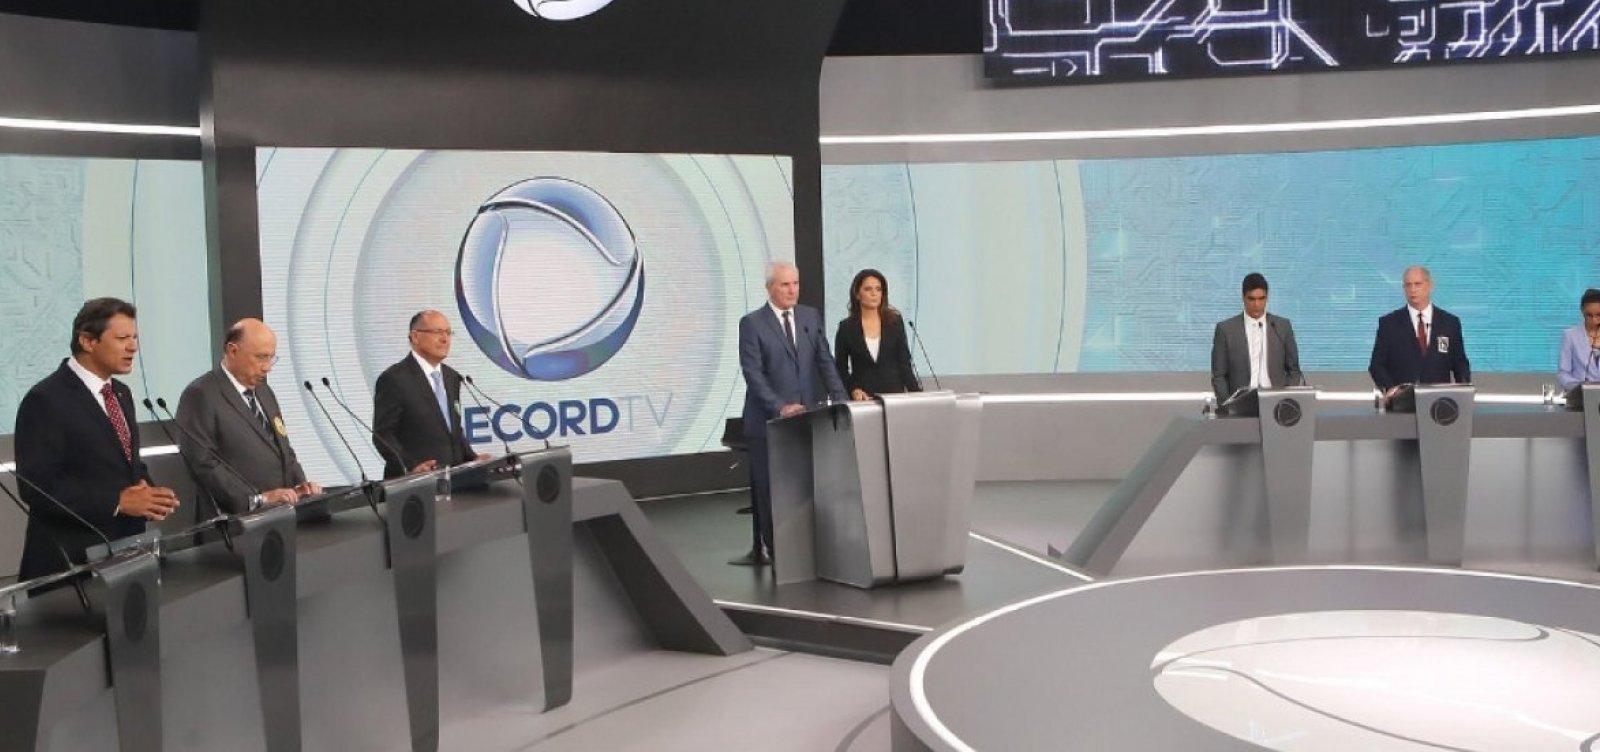 Ibope: Bolsonaro tem 36% e Haddad aparece com 22%